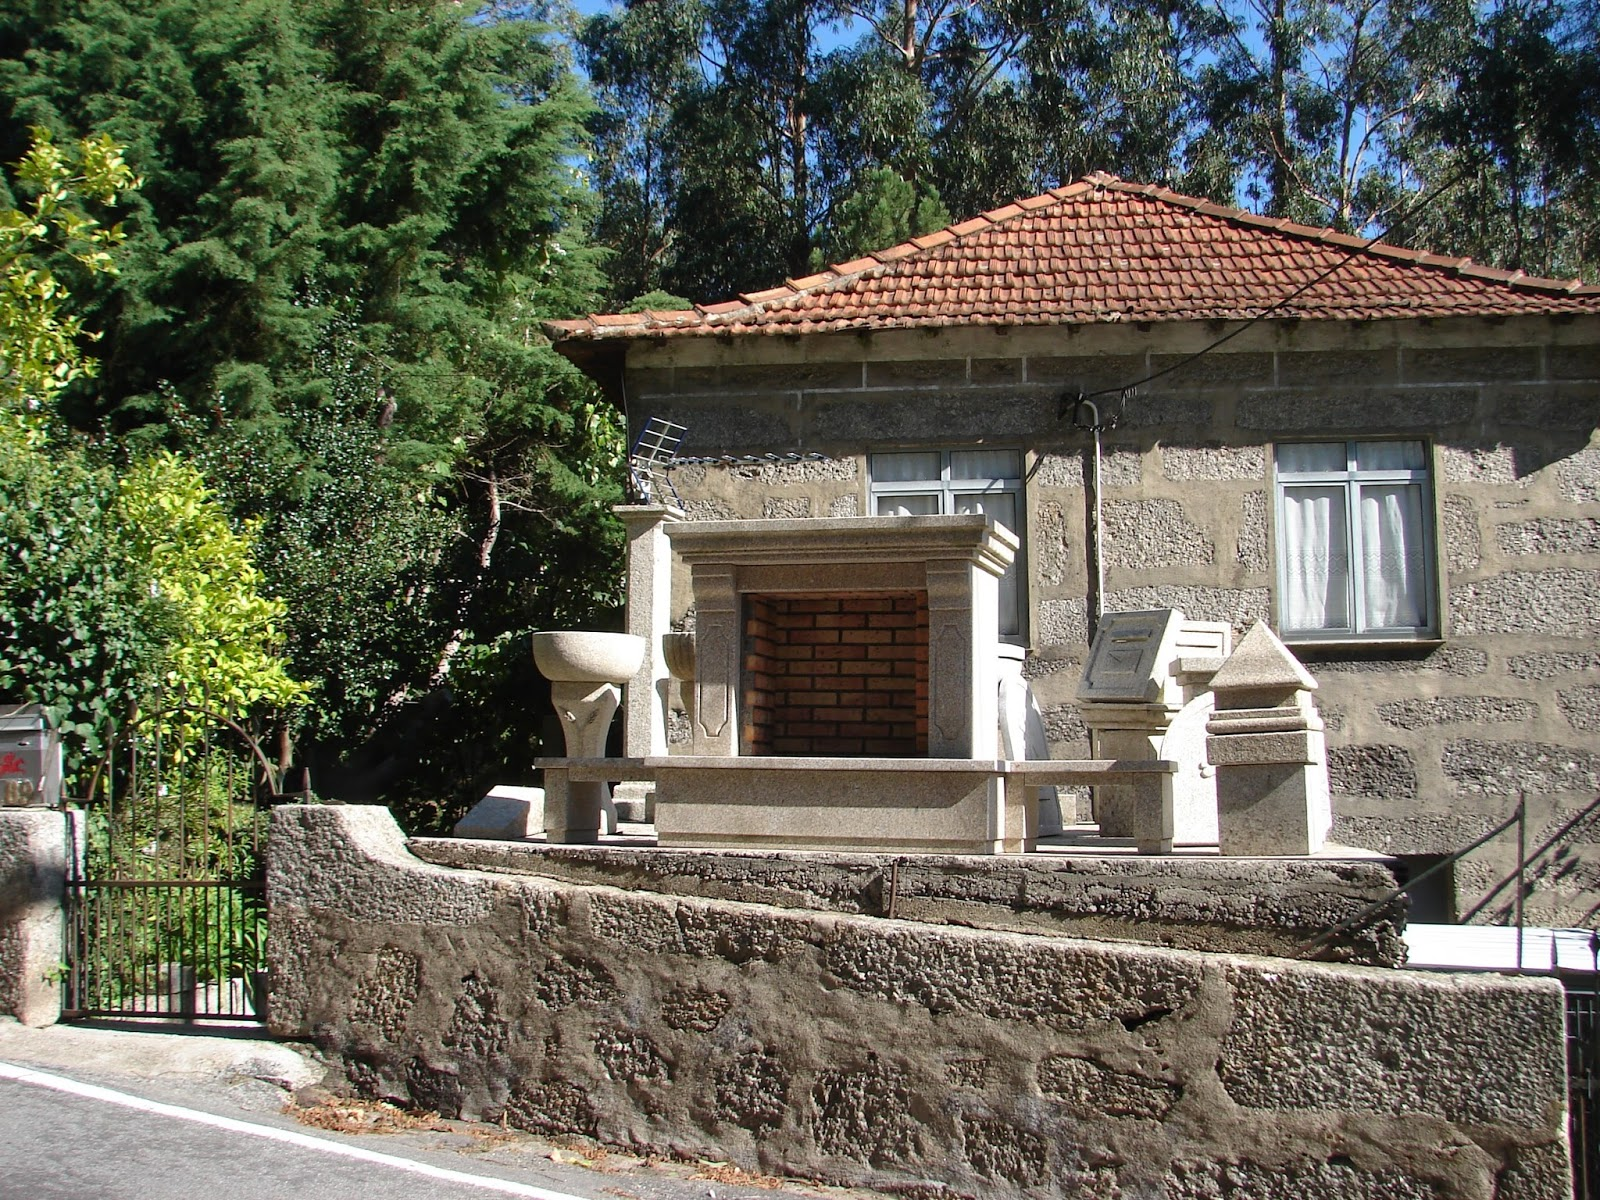 BREATHTAKING: Granite for Good Fences